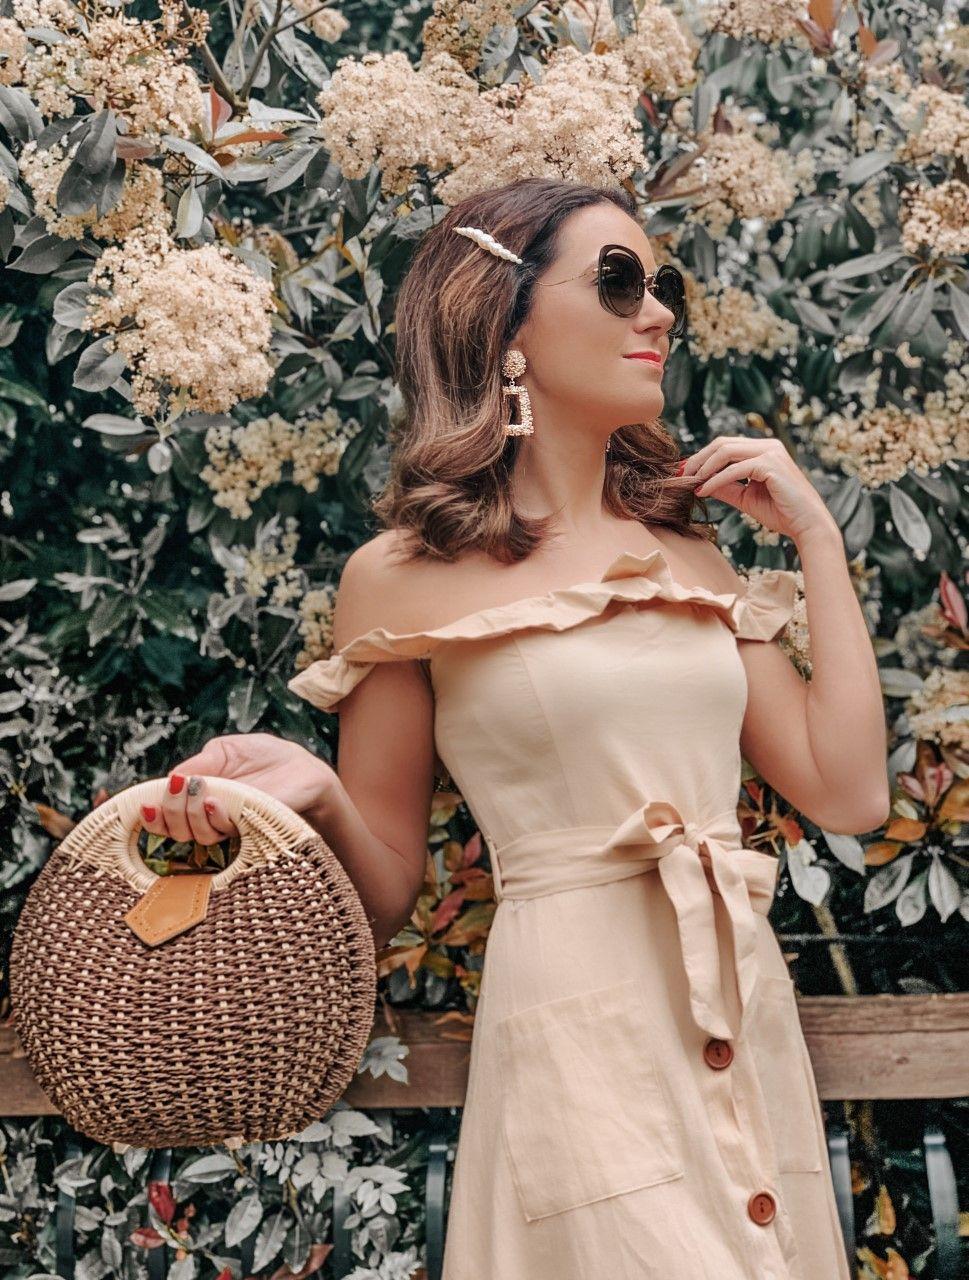 OUTFIT FROM ELEGANT DUCHESS BOUTIQUE Round Summer Beach Straw Bag | Off shoulder ruffle detail midi dress | TEXTURED GEOMETRIC EARRINGS | Pearl Hair Clip | MIU MIU SUNGLASSES | NEXT Plait Detail Espadrille Wedges